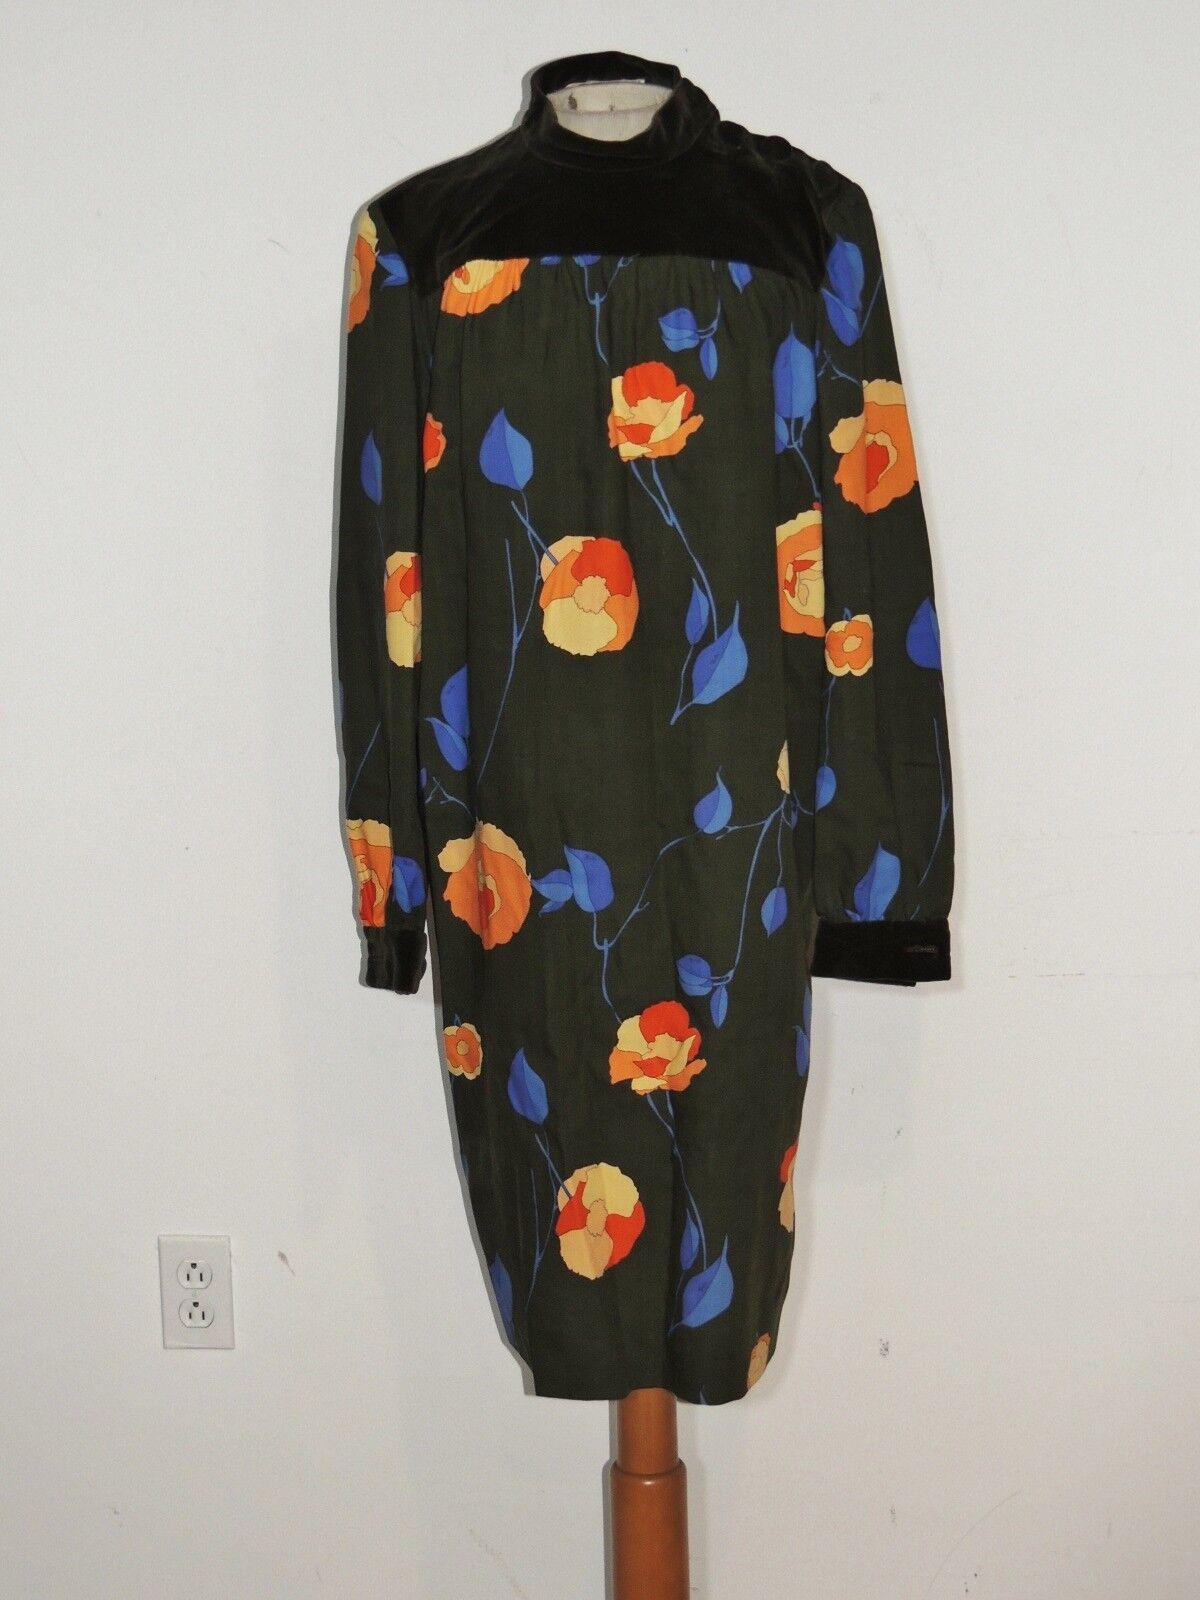 Vintage 1960's Emilio PUCCI Velvet / Wool Challis Floral Print MOD Dress MED 12